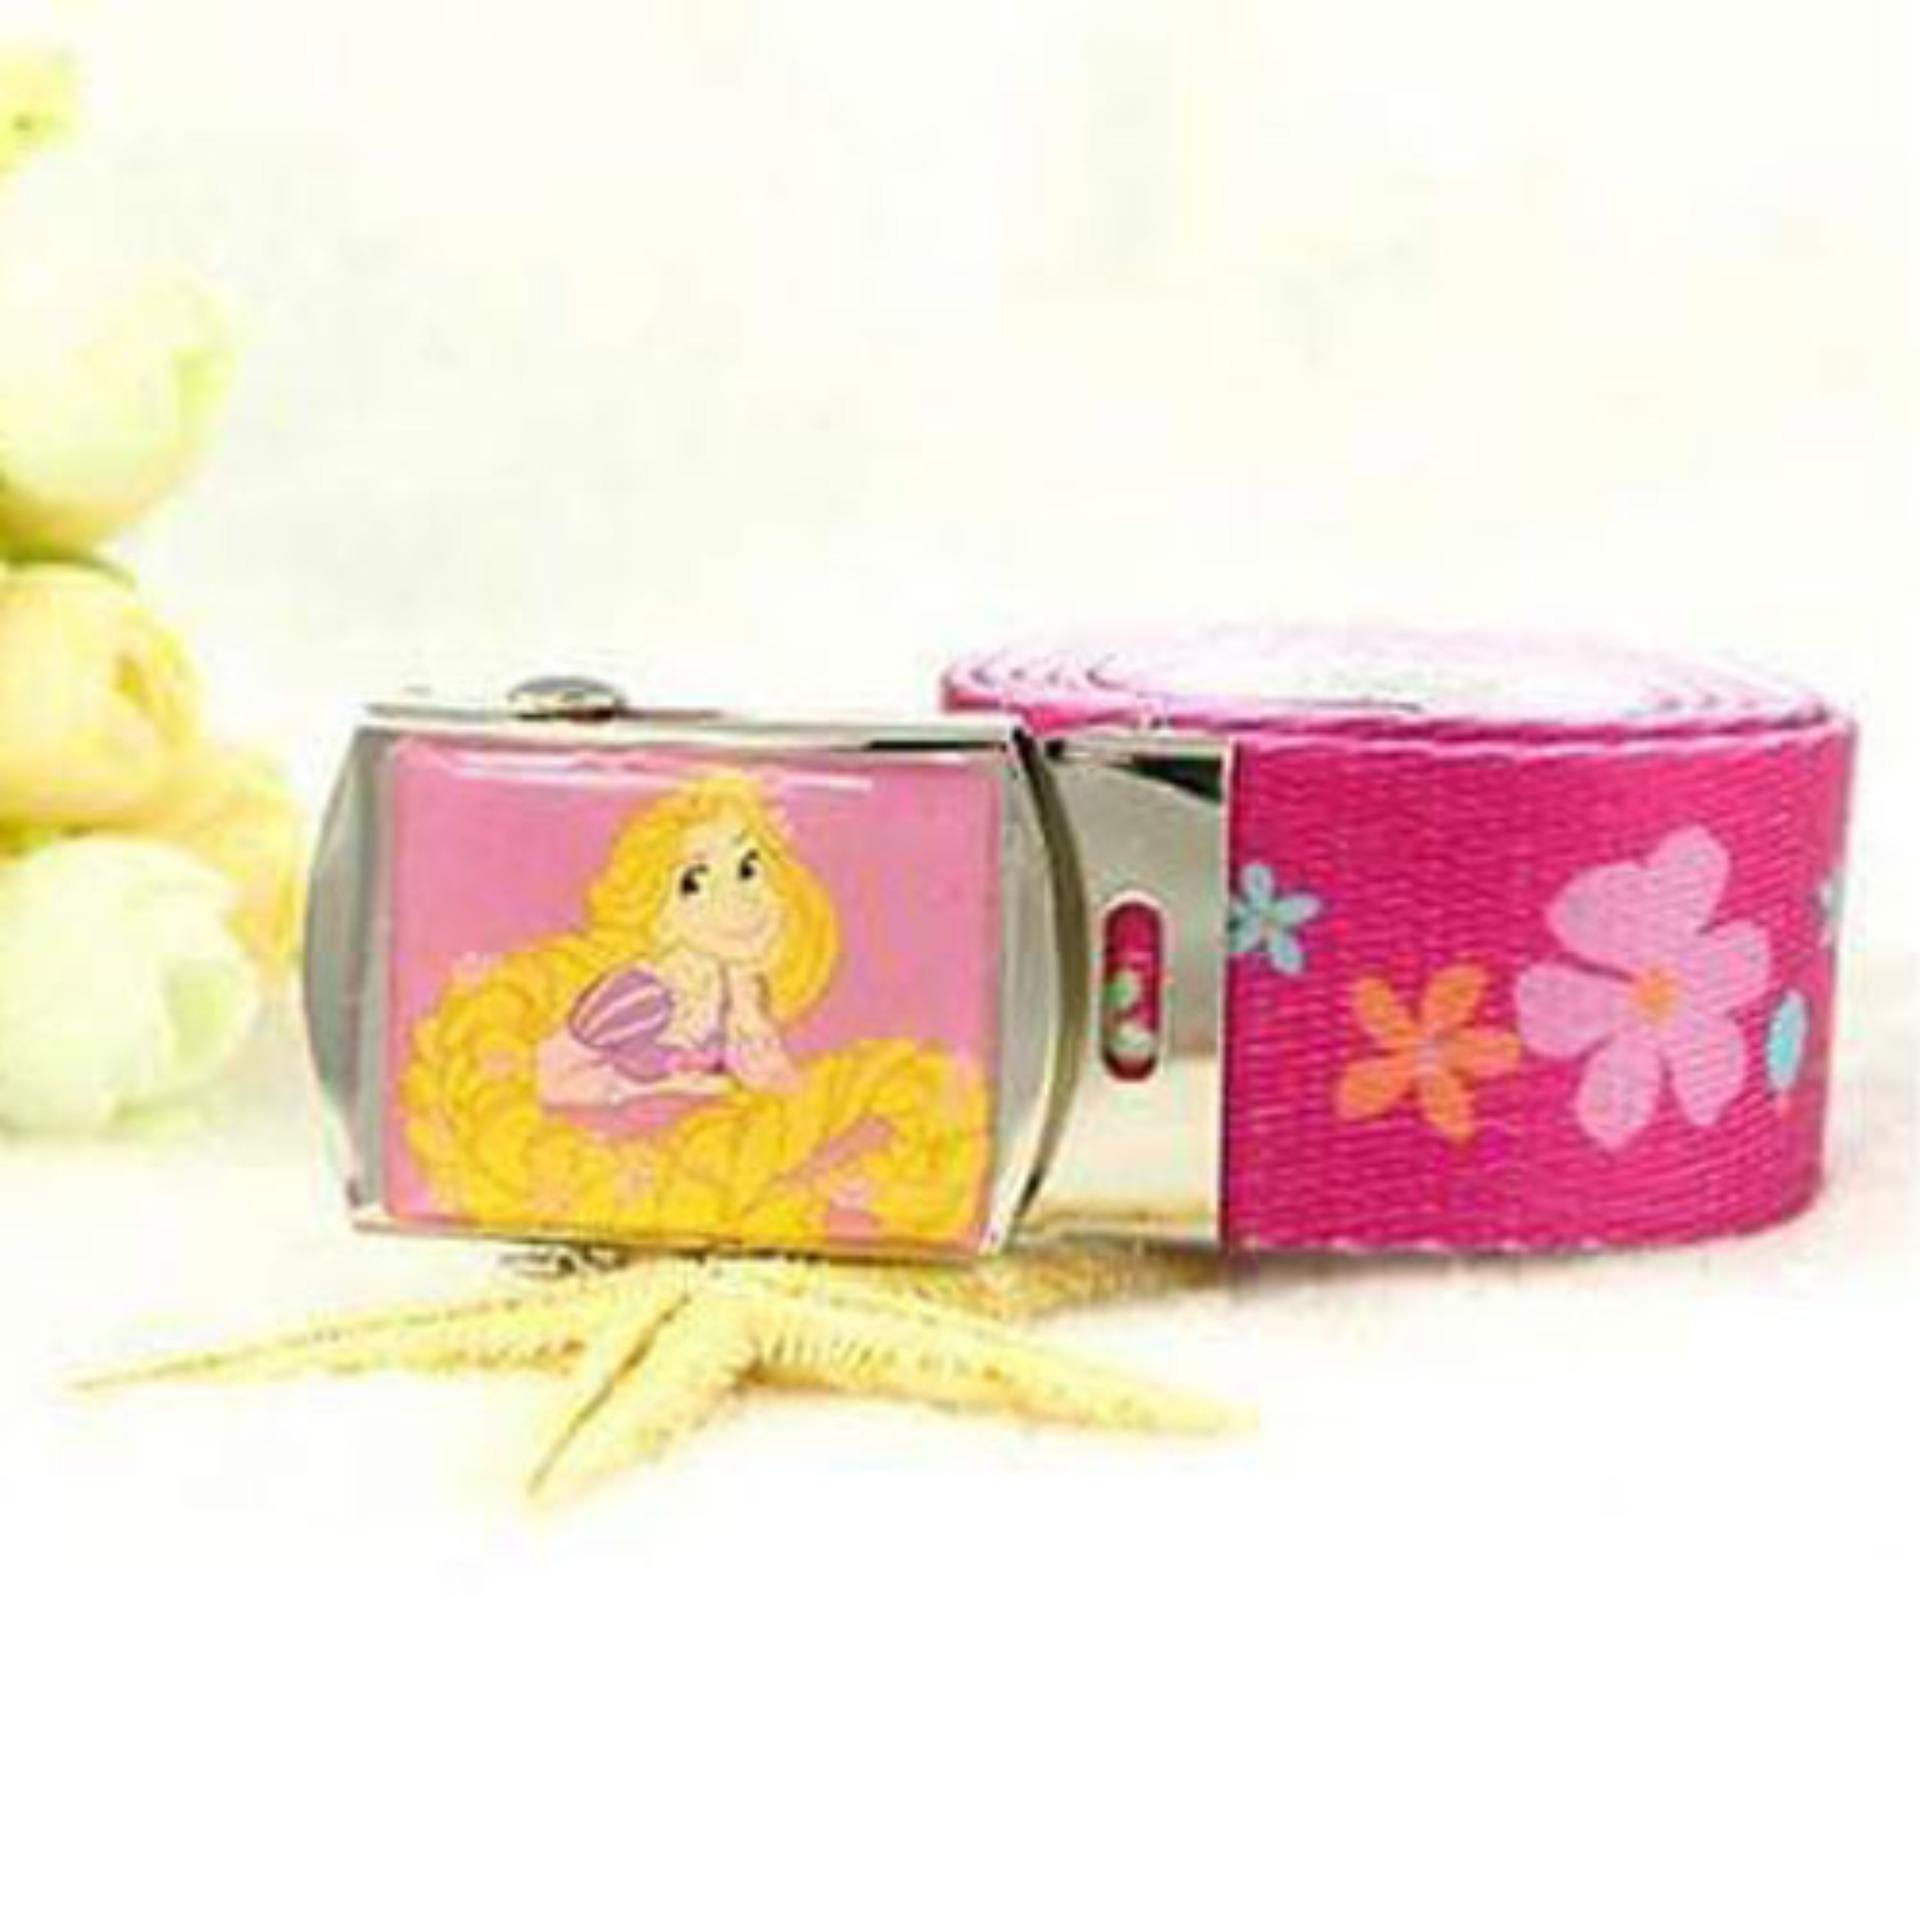 Kelebihan Clkd33 Celana Pendek Anak Cewek Butterfly Pink White Perempuan Sabuk Ikat Pinggang Princess Snow Import Belt